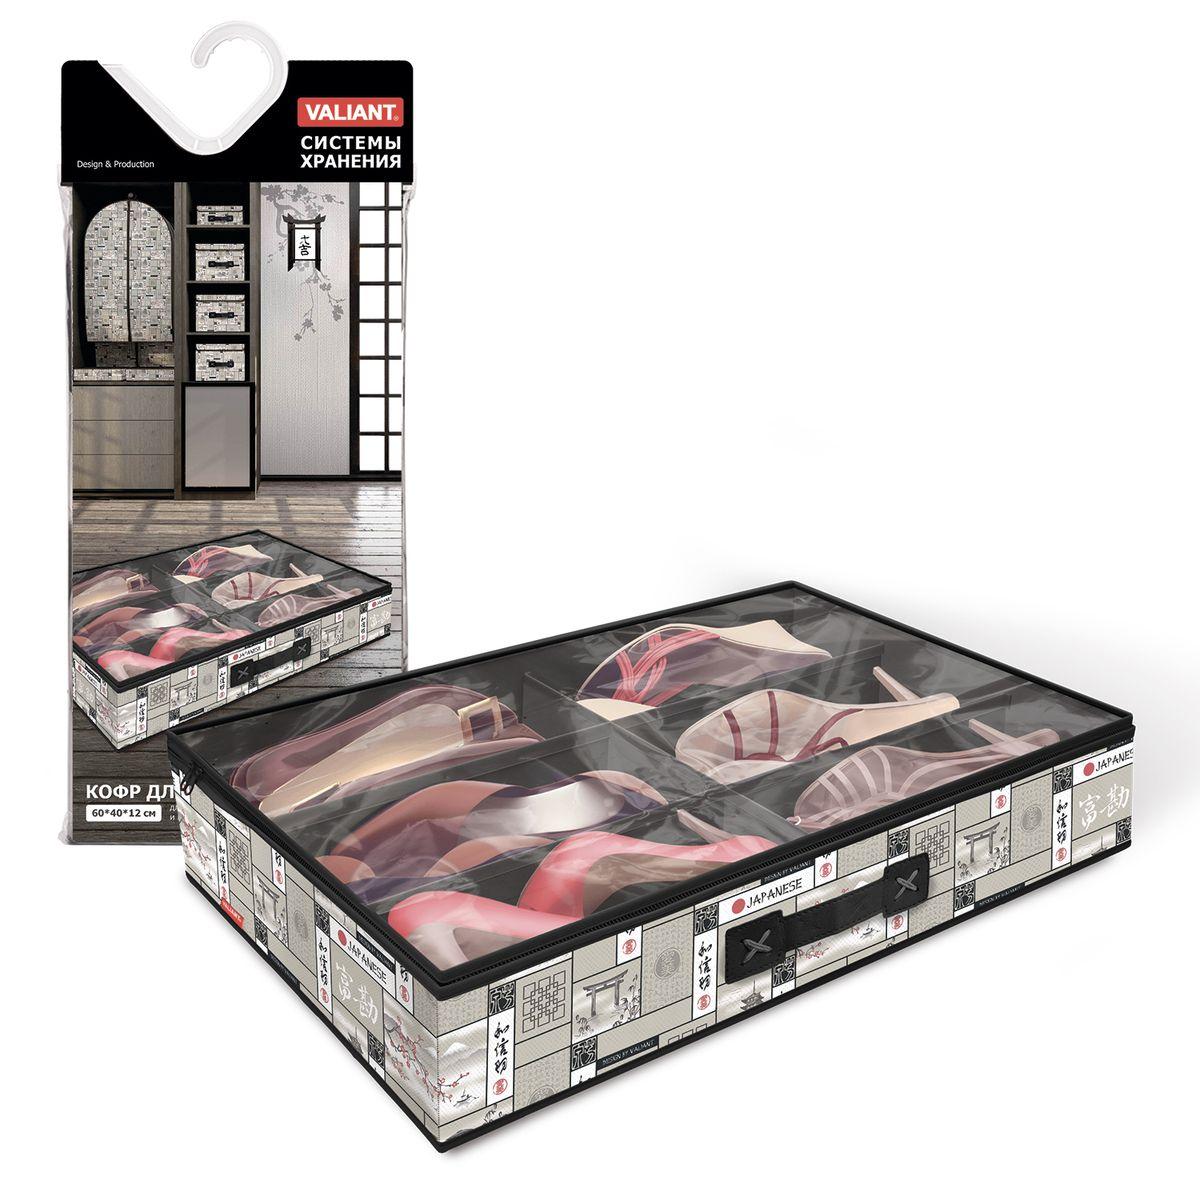 Кофр для хранения обуви Valiant Japanese White, 6 секций, 60 х 40 х 12 см